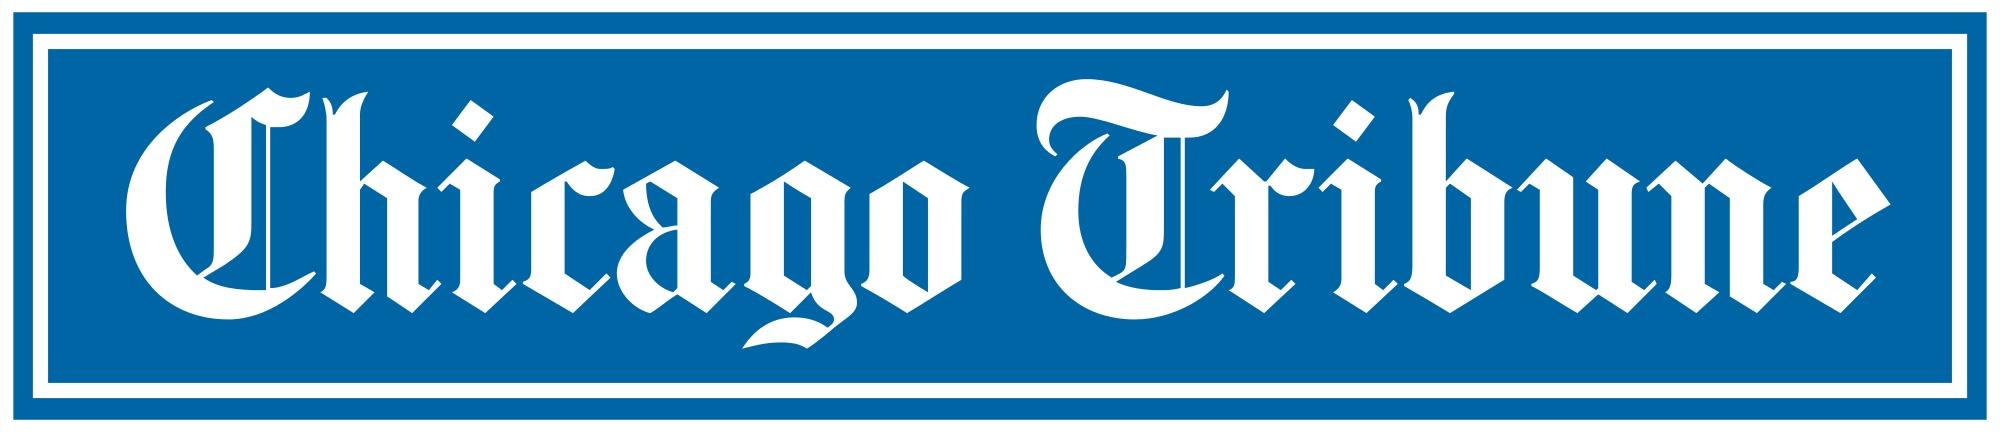 (LOGO) Chicago Tribune.jpg